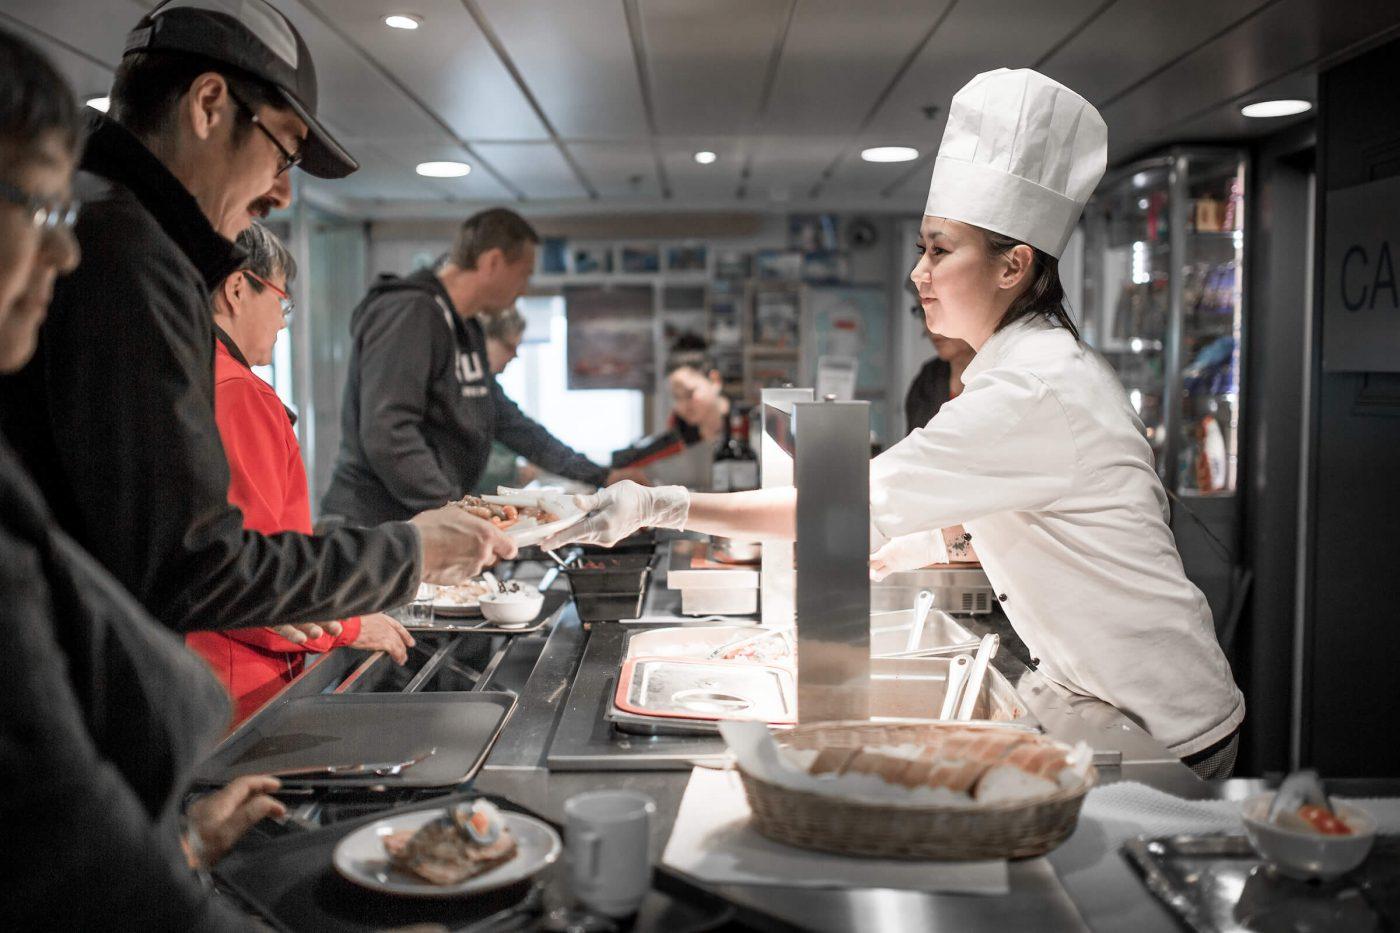 A chef serving dinner on board the passenger ferry Sarfaq Ittuk in Greenland. Visit Greenland